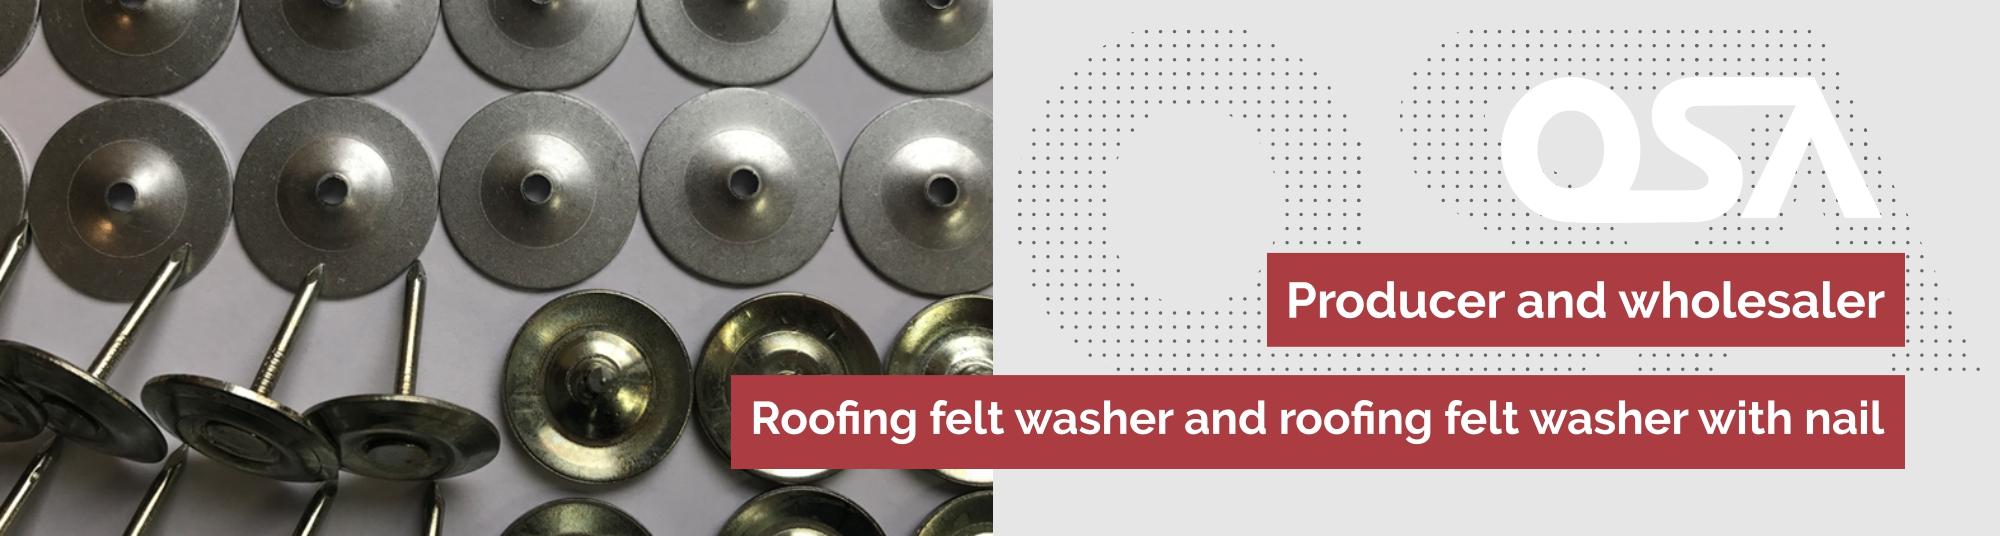 Roofing felt washer producer and wholesaler